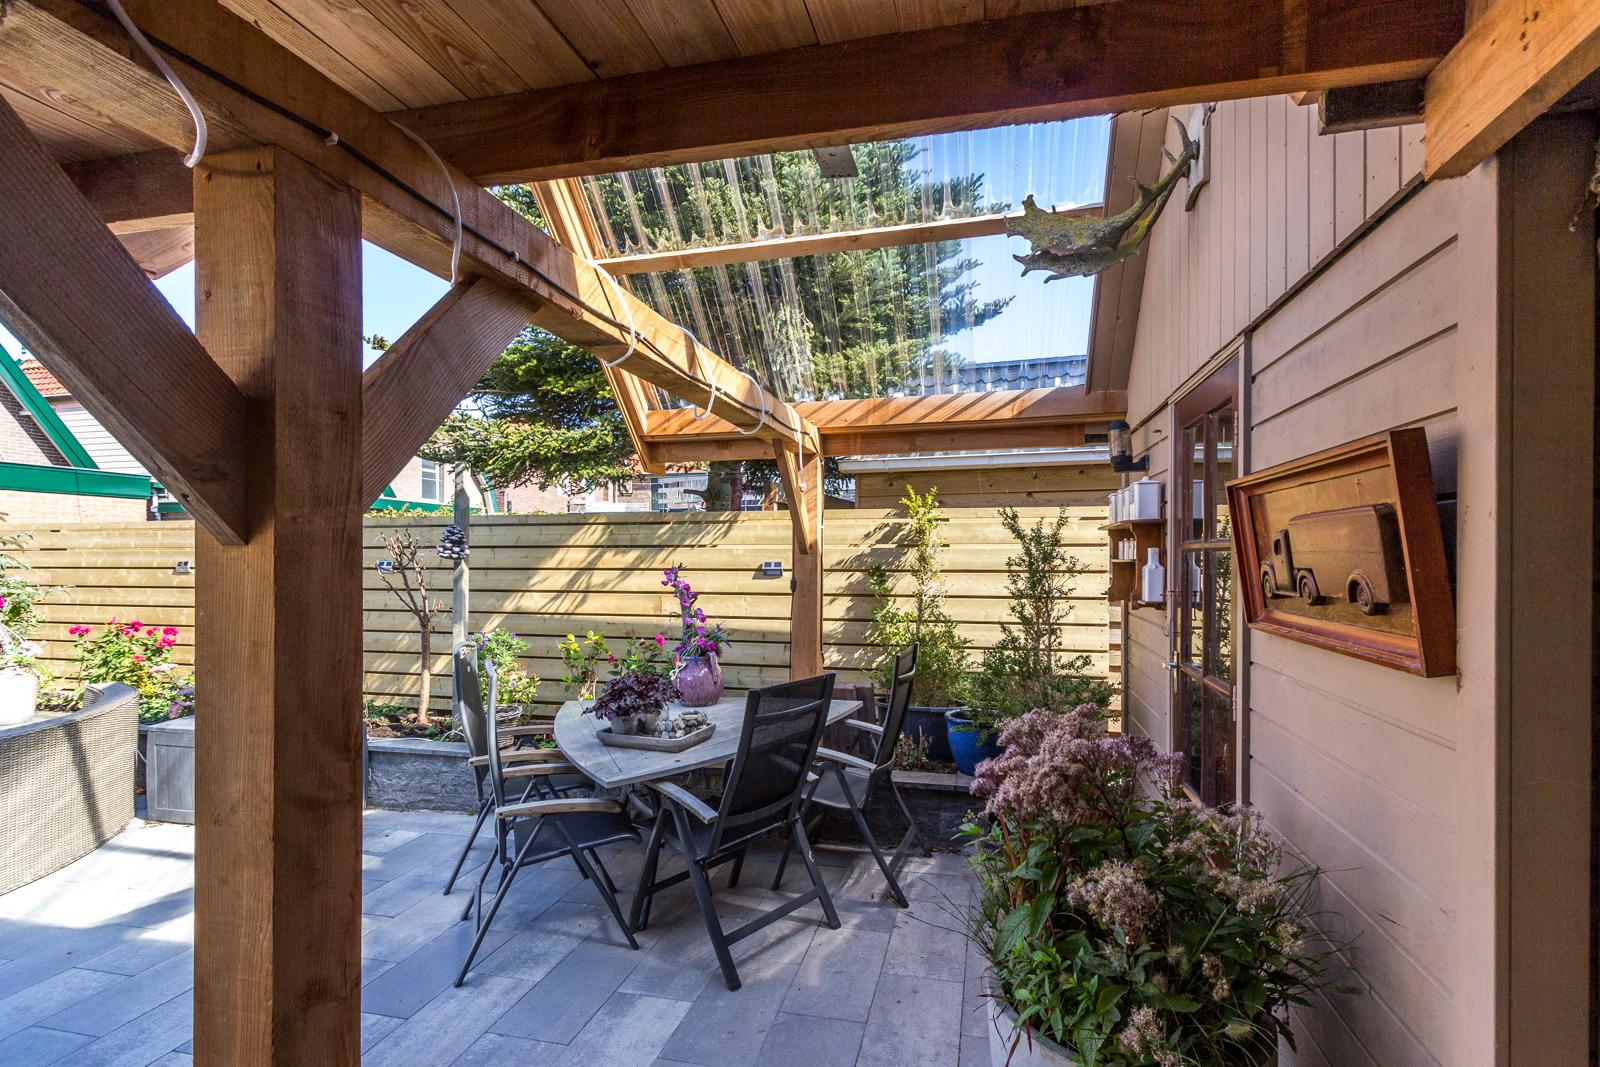 veranda-Den-Oever-5321